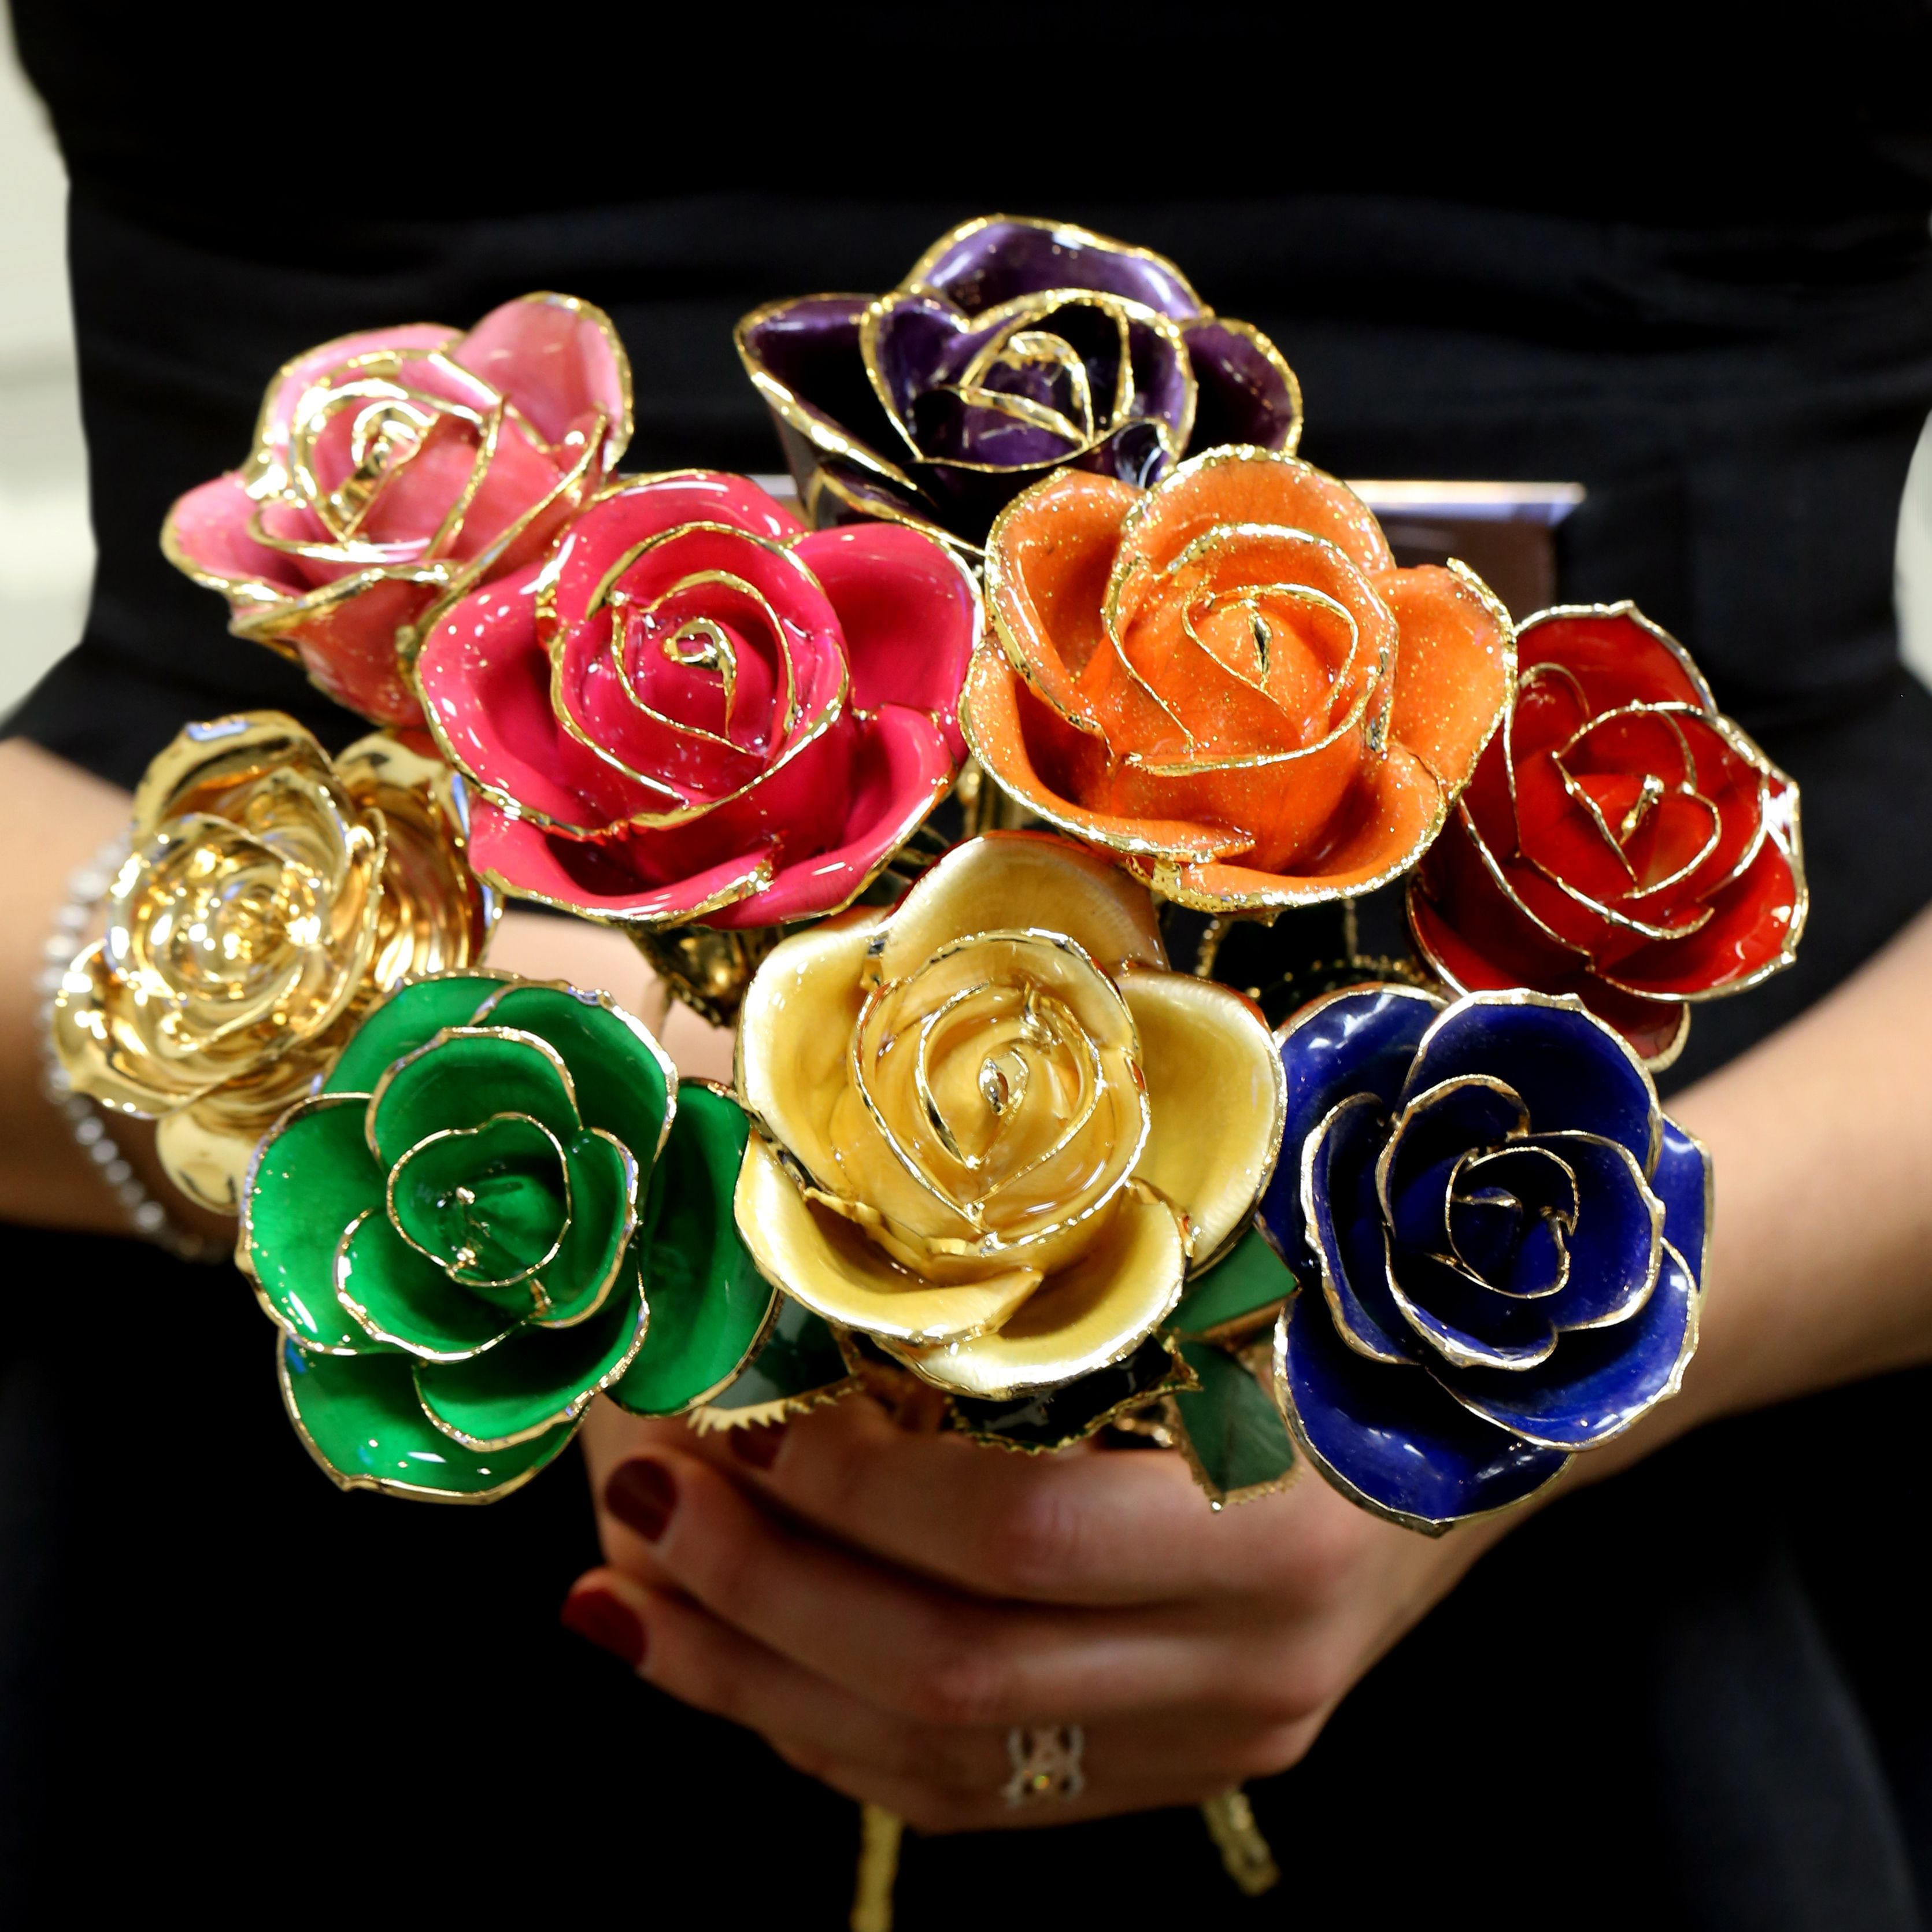 Steven Singer Jeweler Gold Dipped Rose Rose Just Peachy